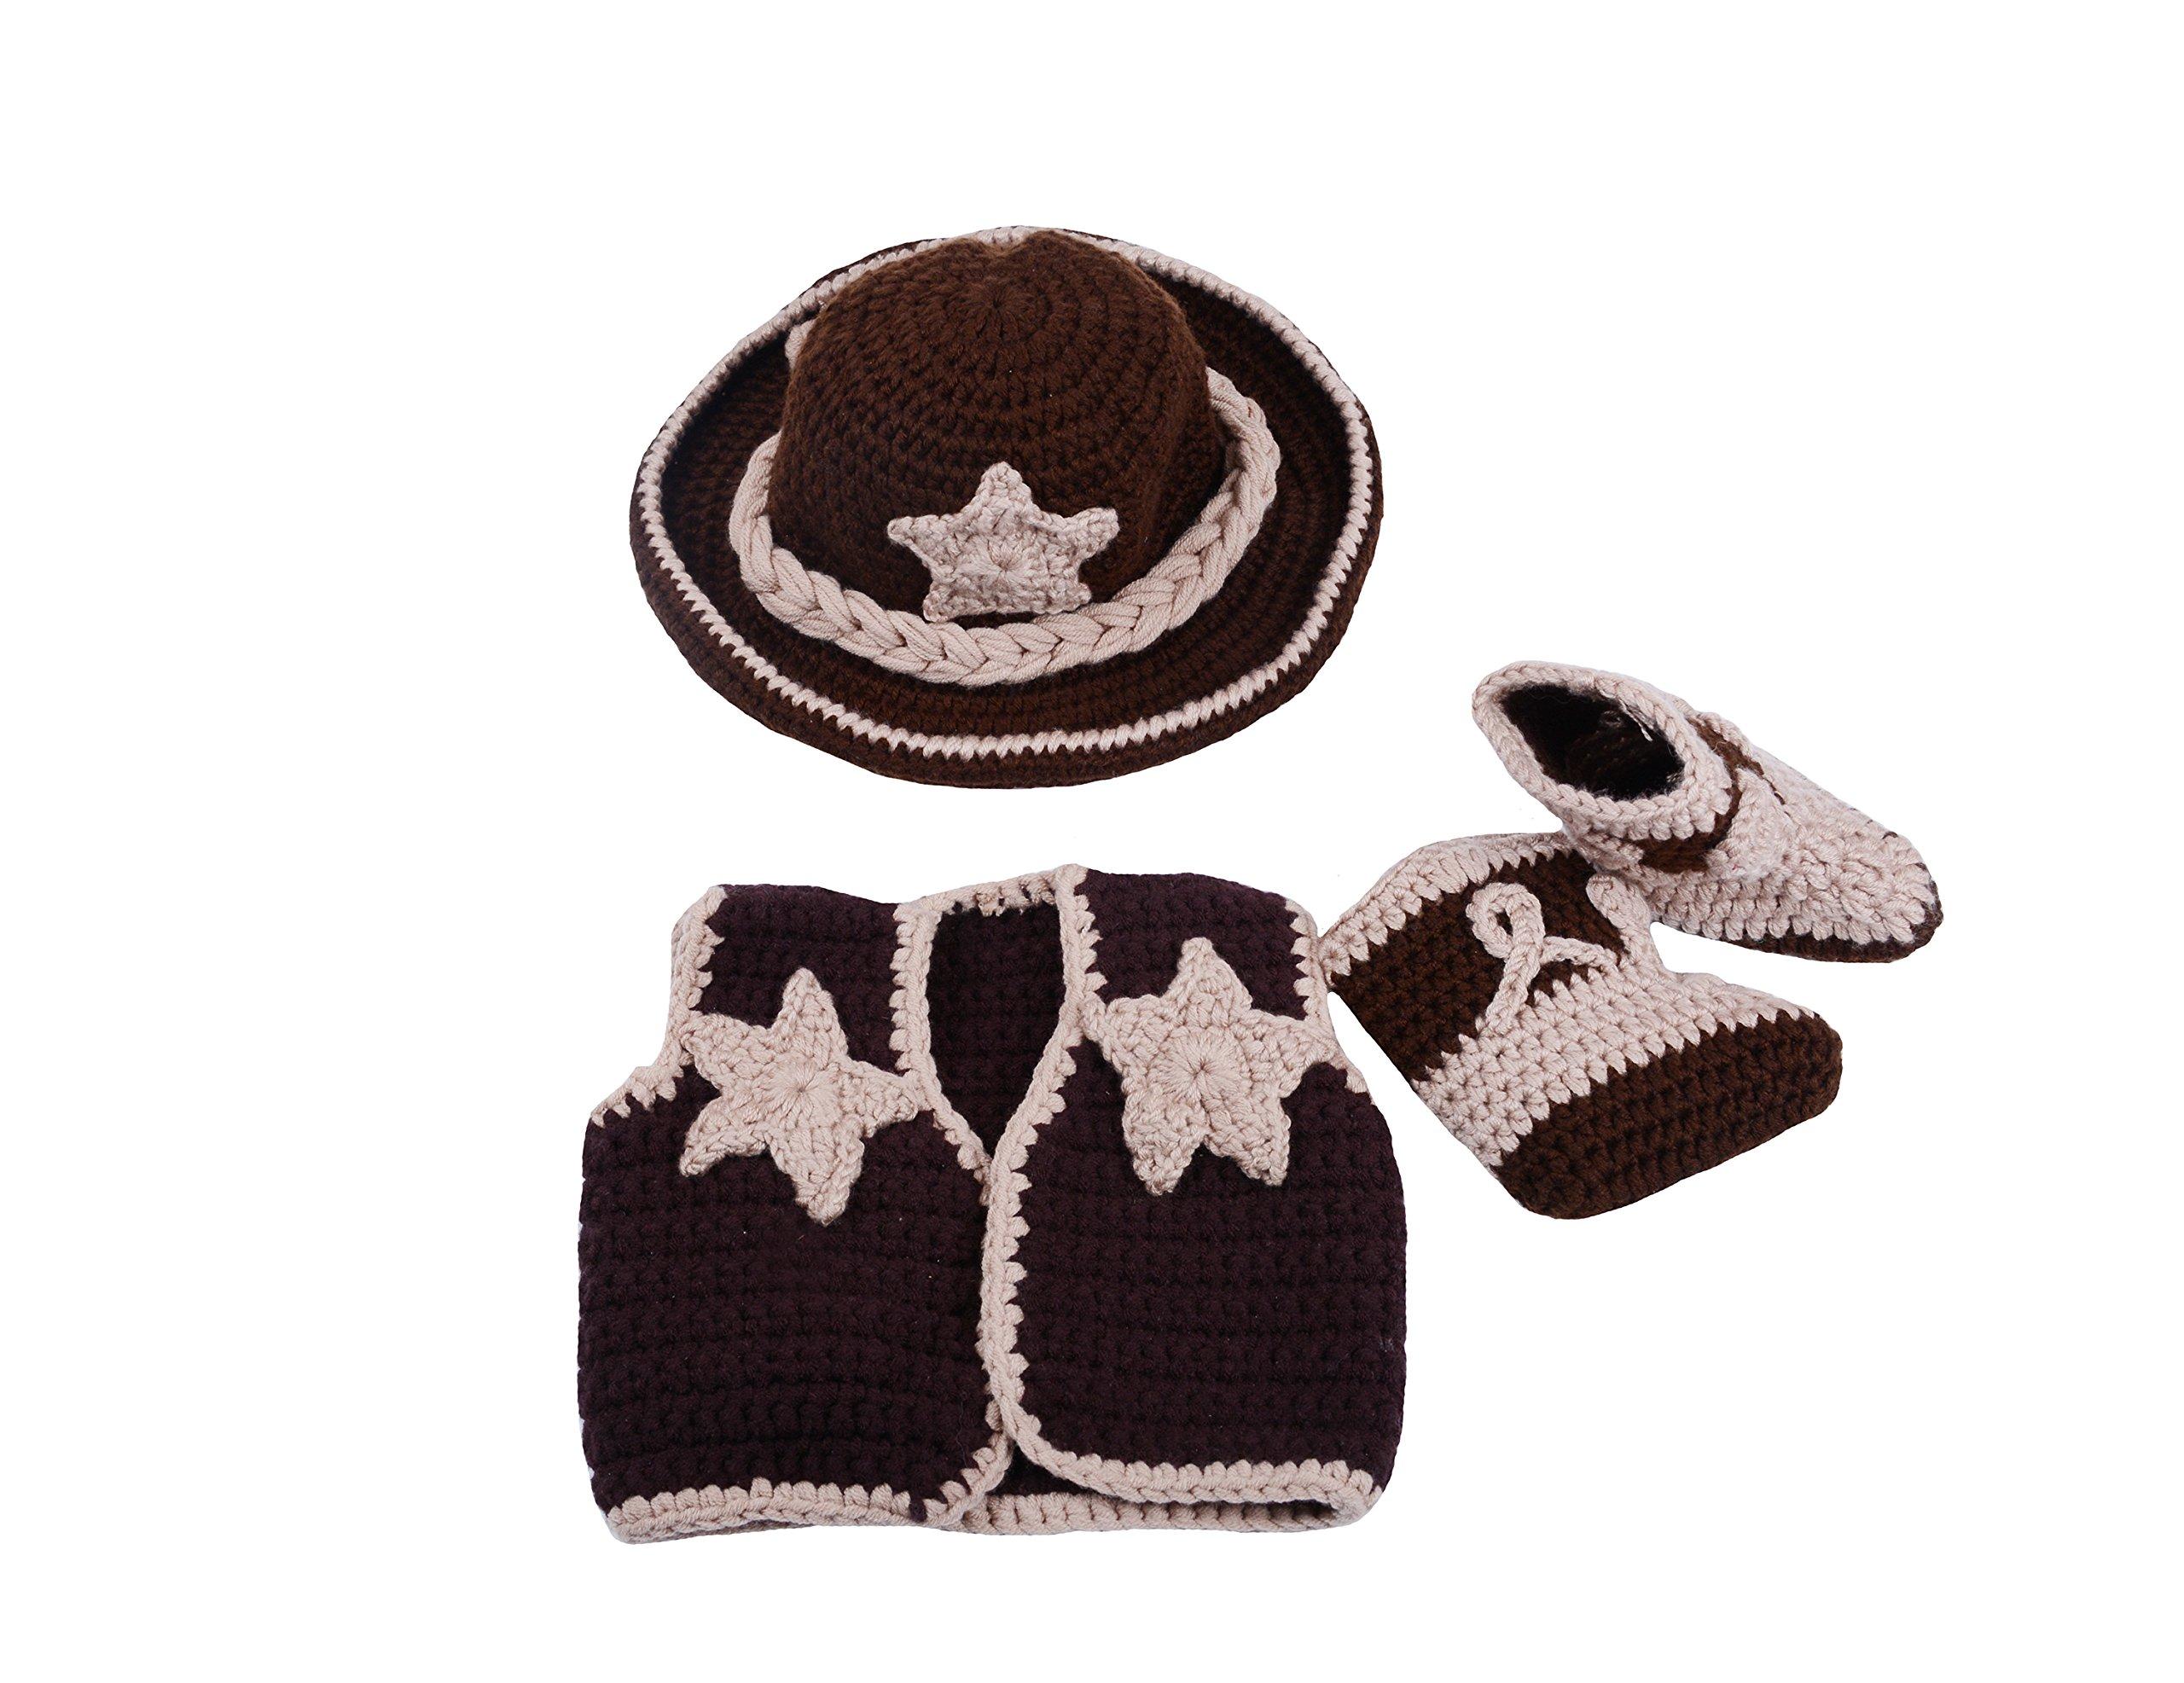 CX-Queen Newborn Baby Photography Prop Crochet Cowboy Hat Boot Diaper Set Costume (Style 4)